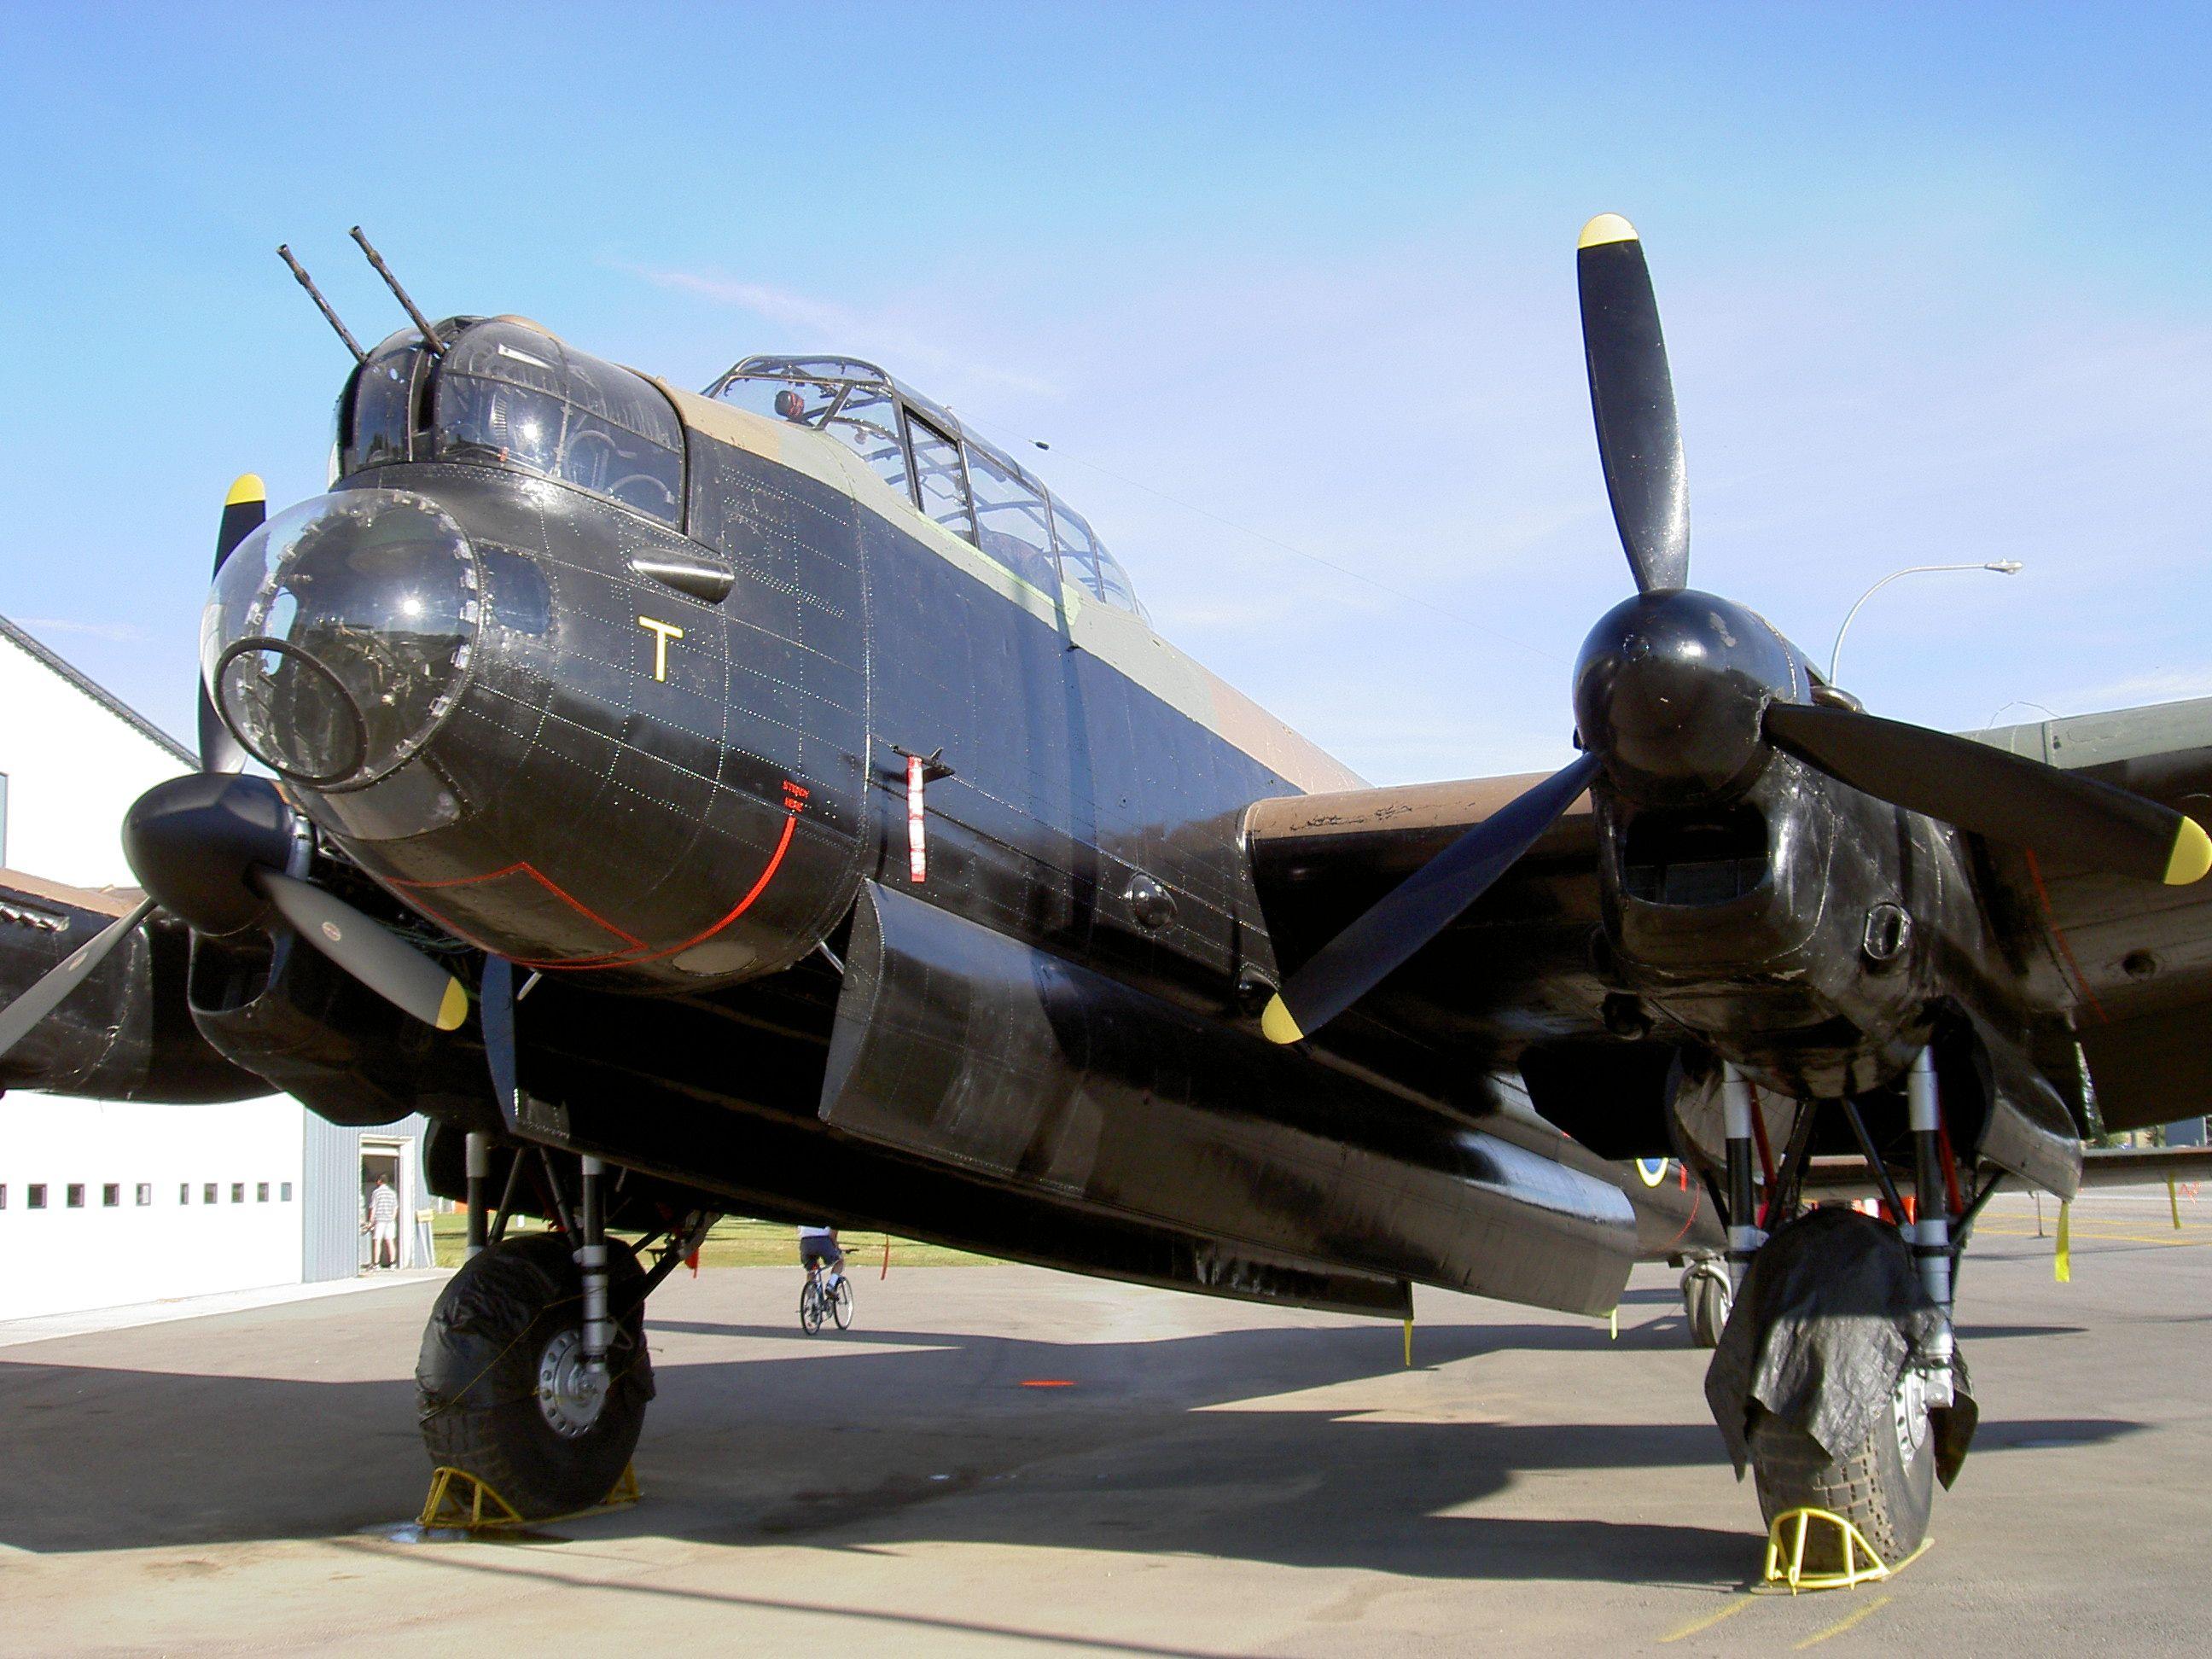 best 25 ww2 planes ideas on pinterest aircraft allied powers